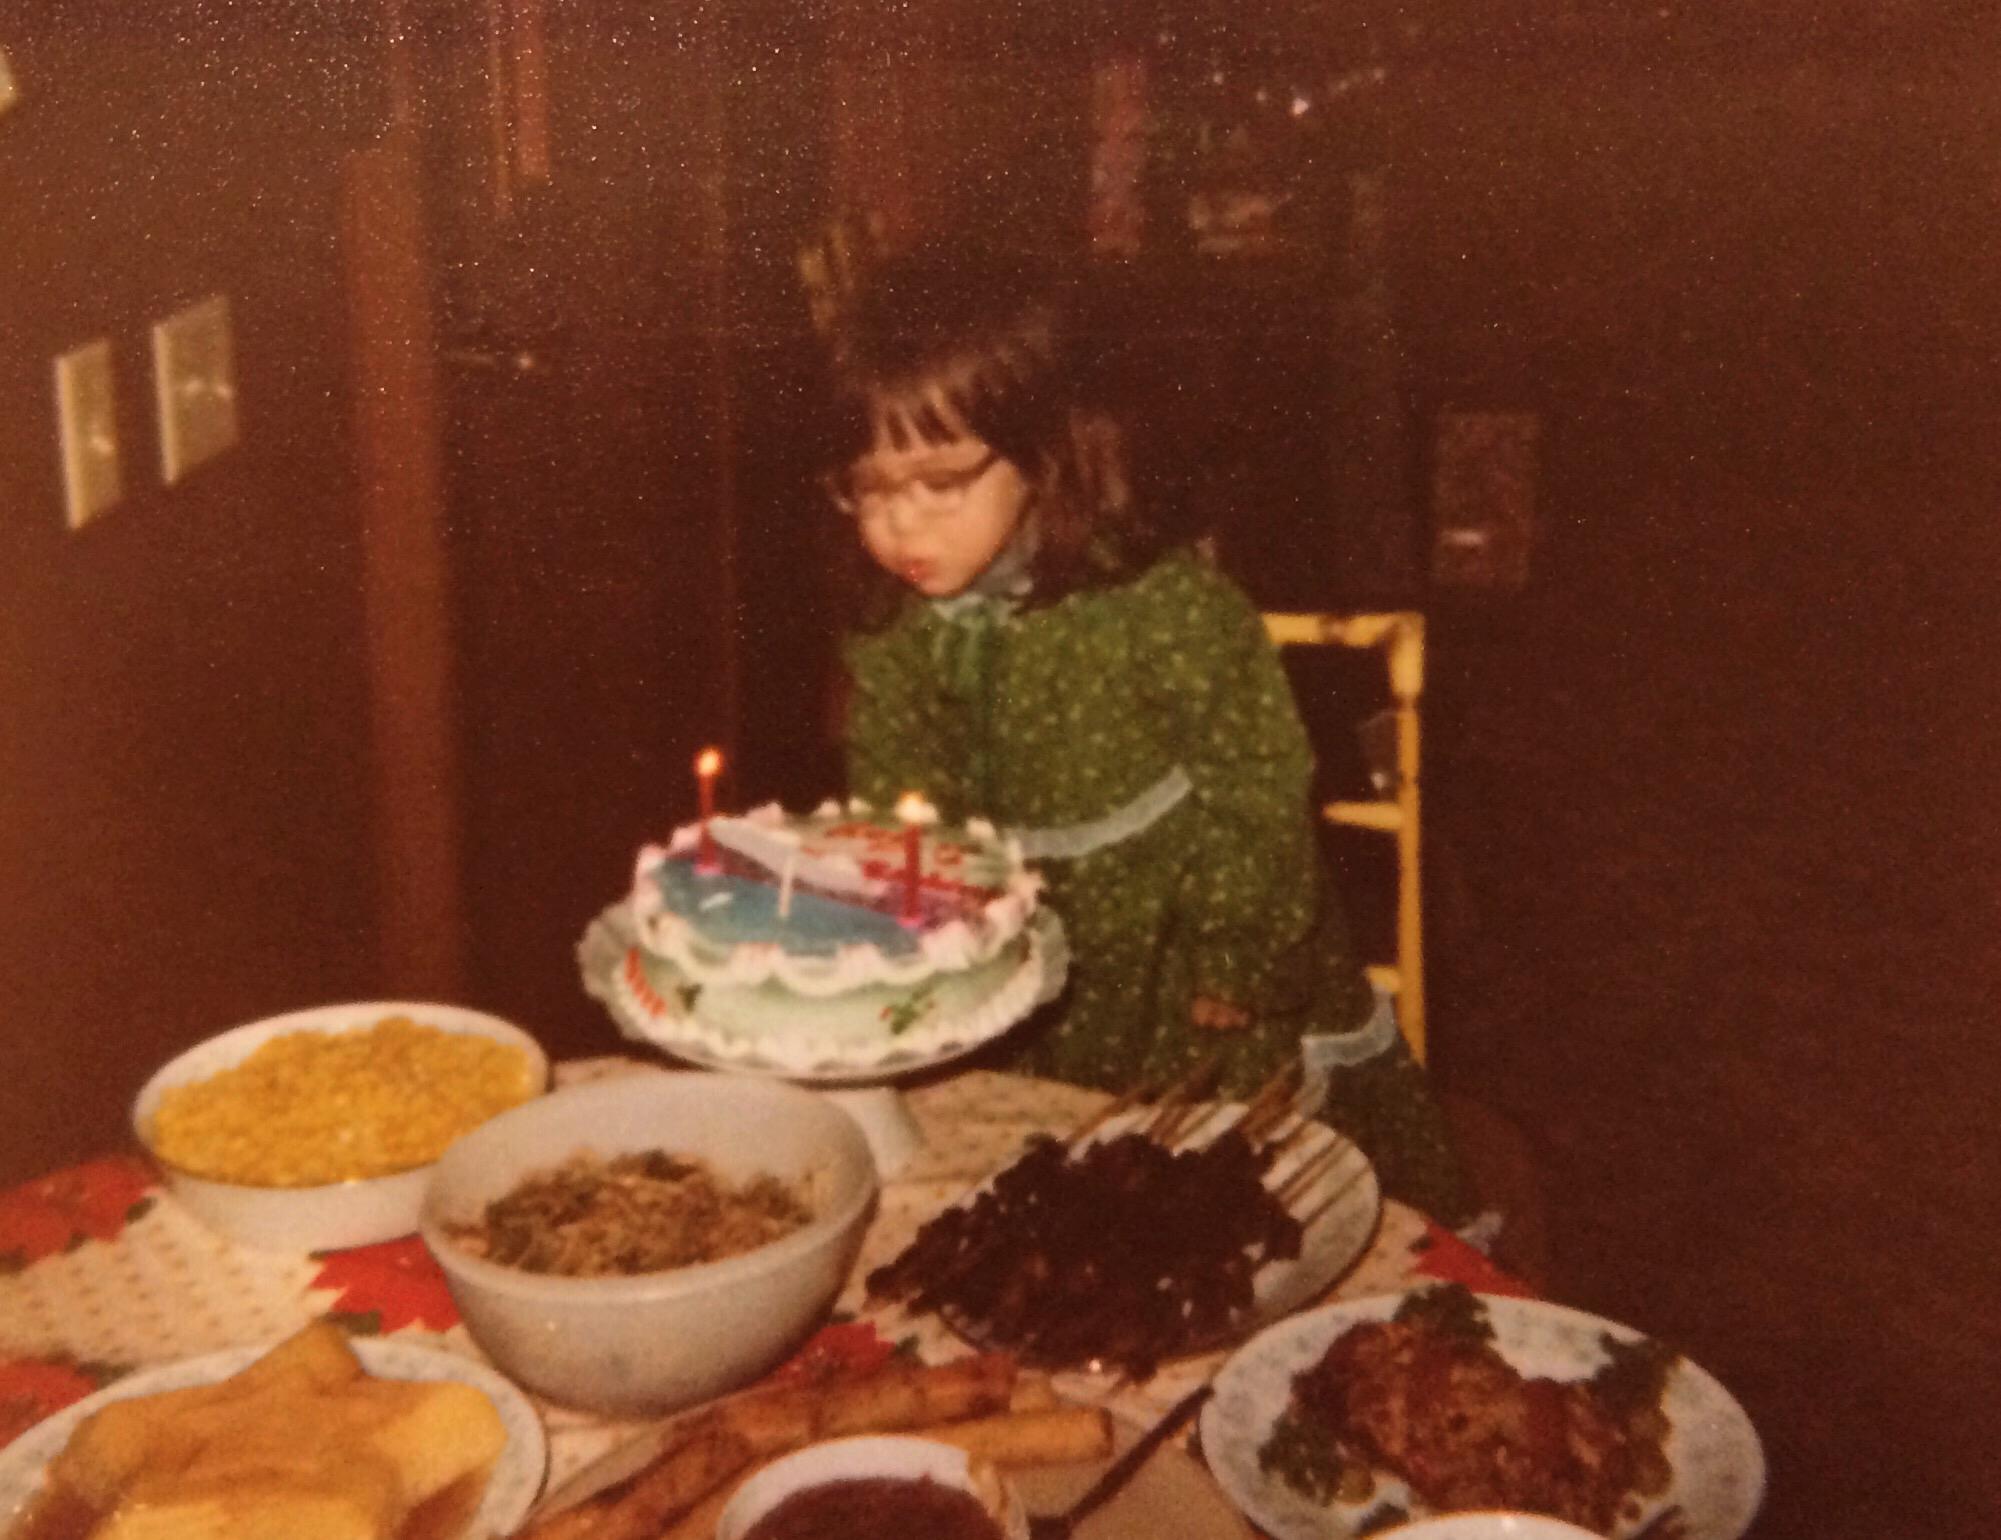 My second birthday 12/25/1978